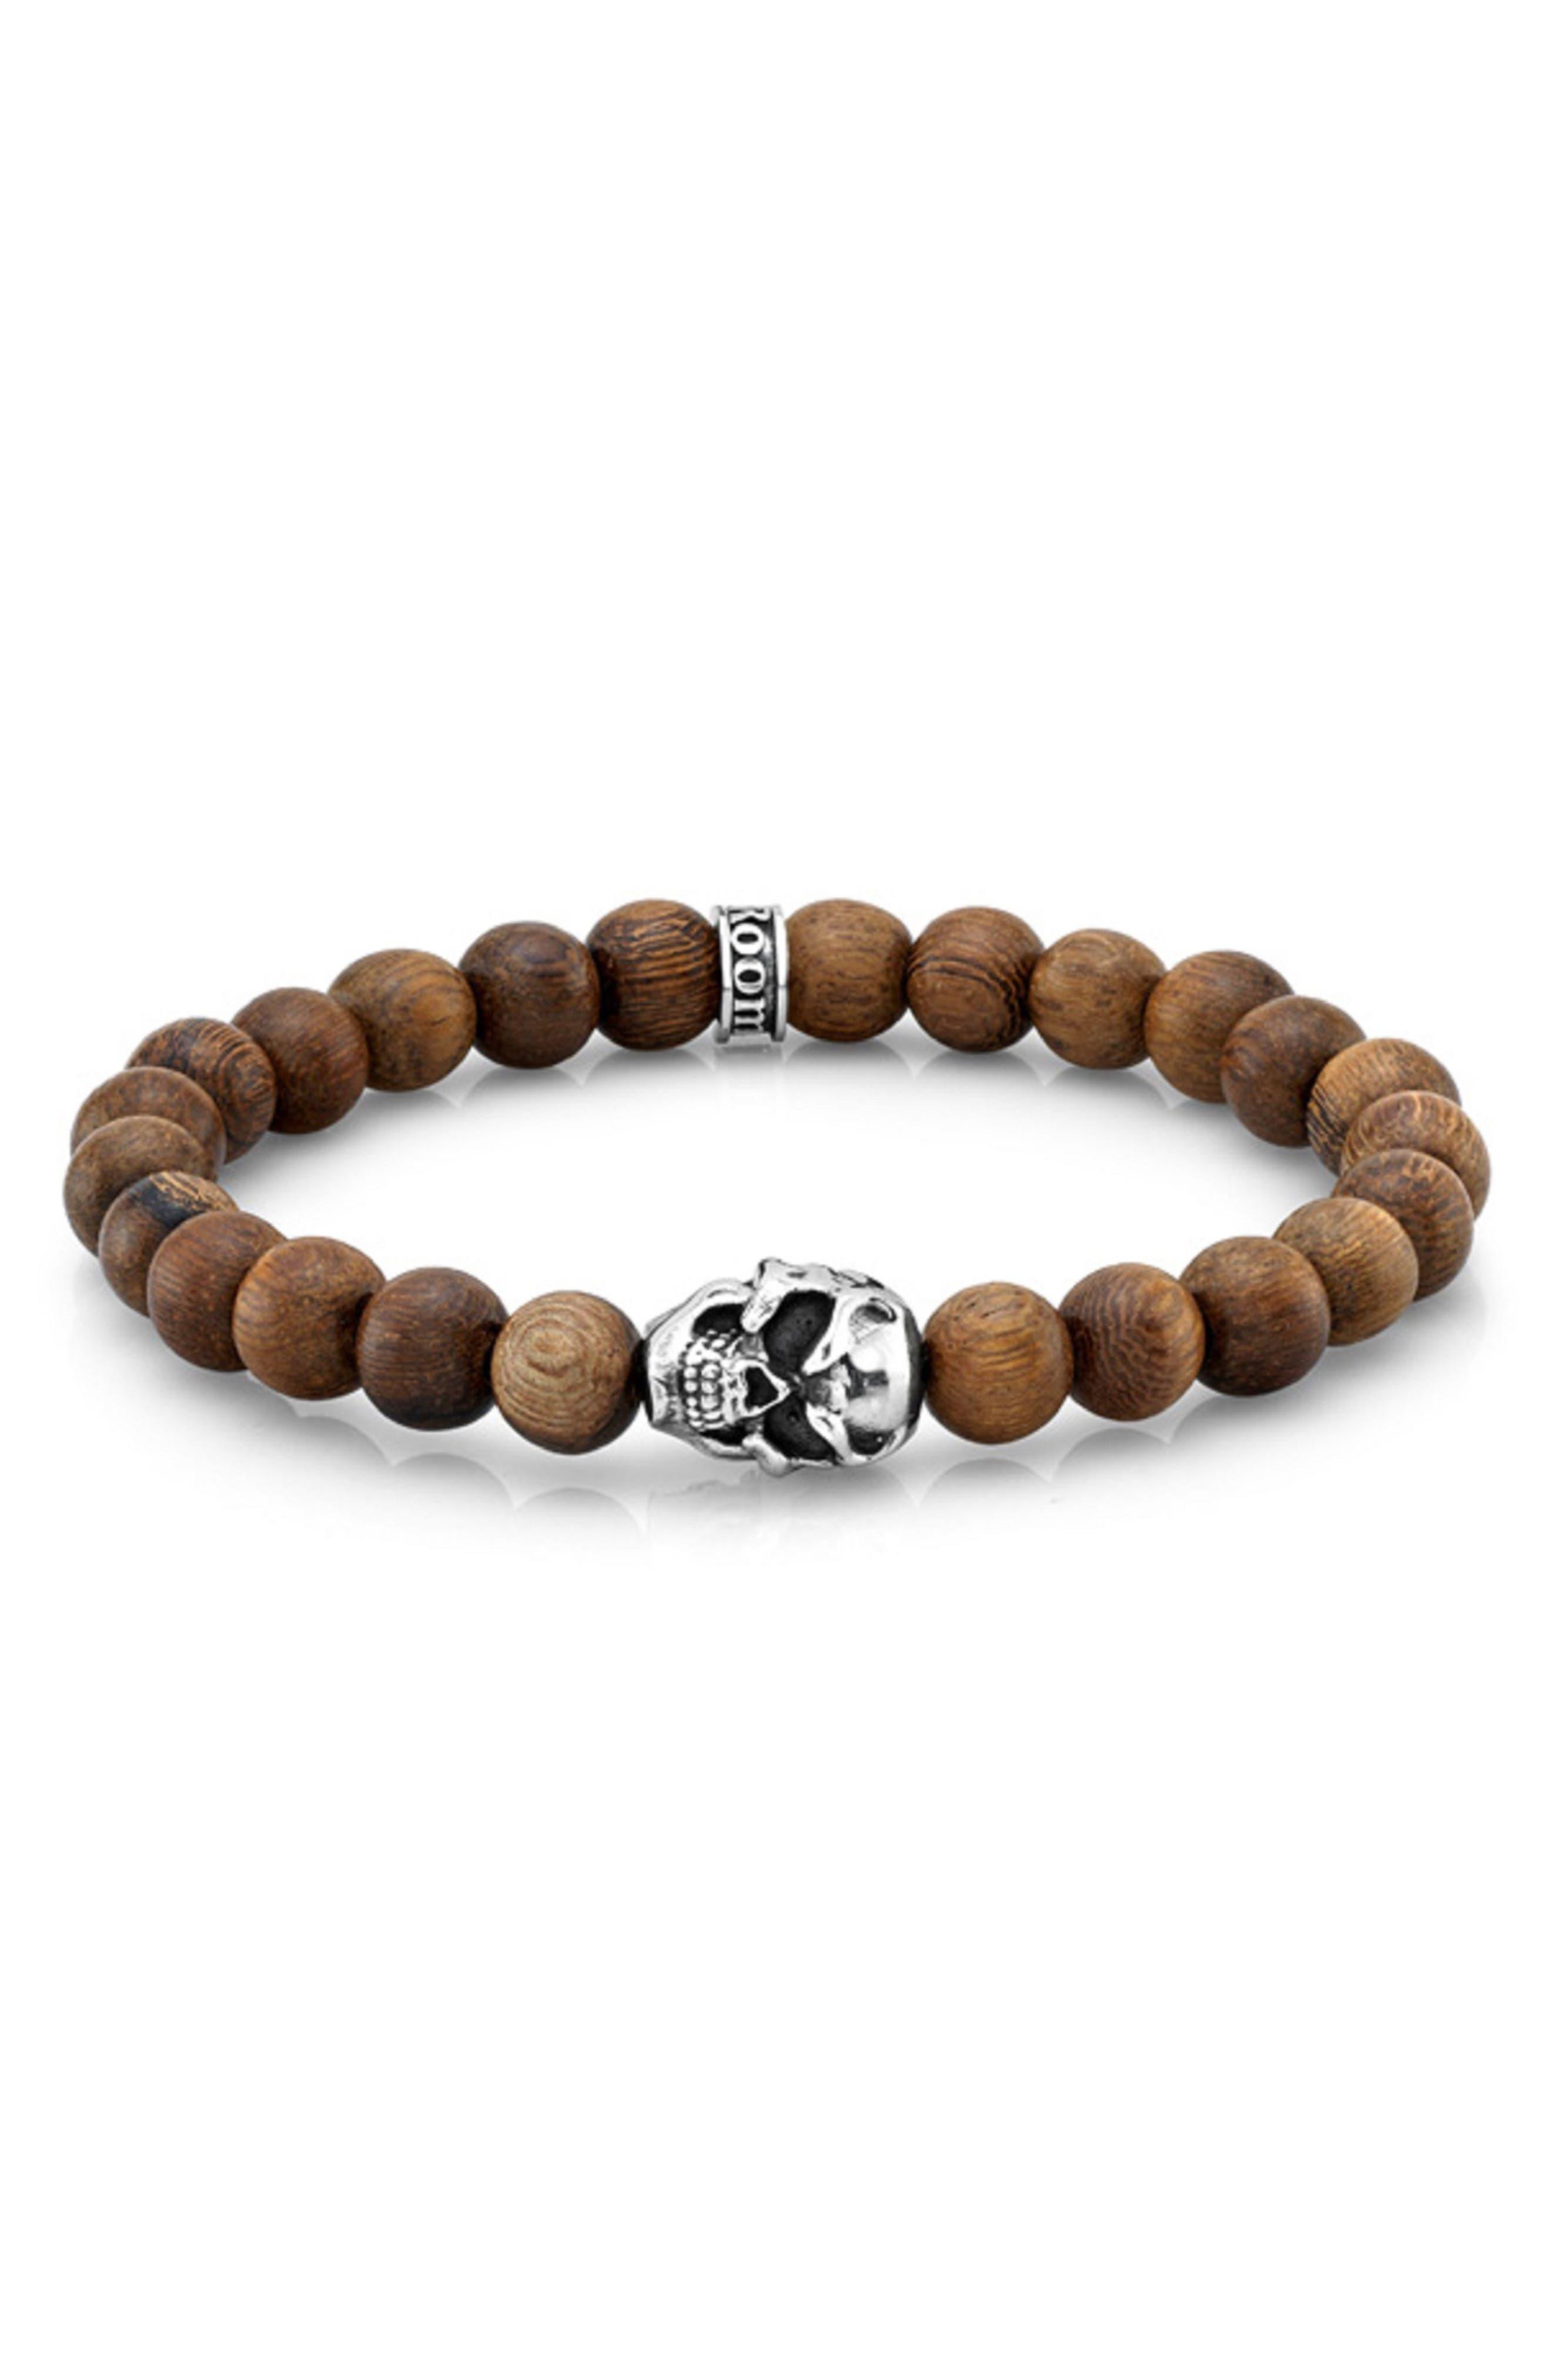 Alternate Image 1 Selected - Room101 Wood Bead Bracelet